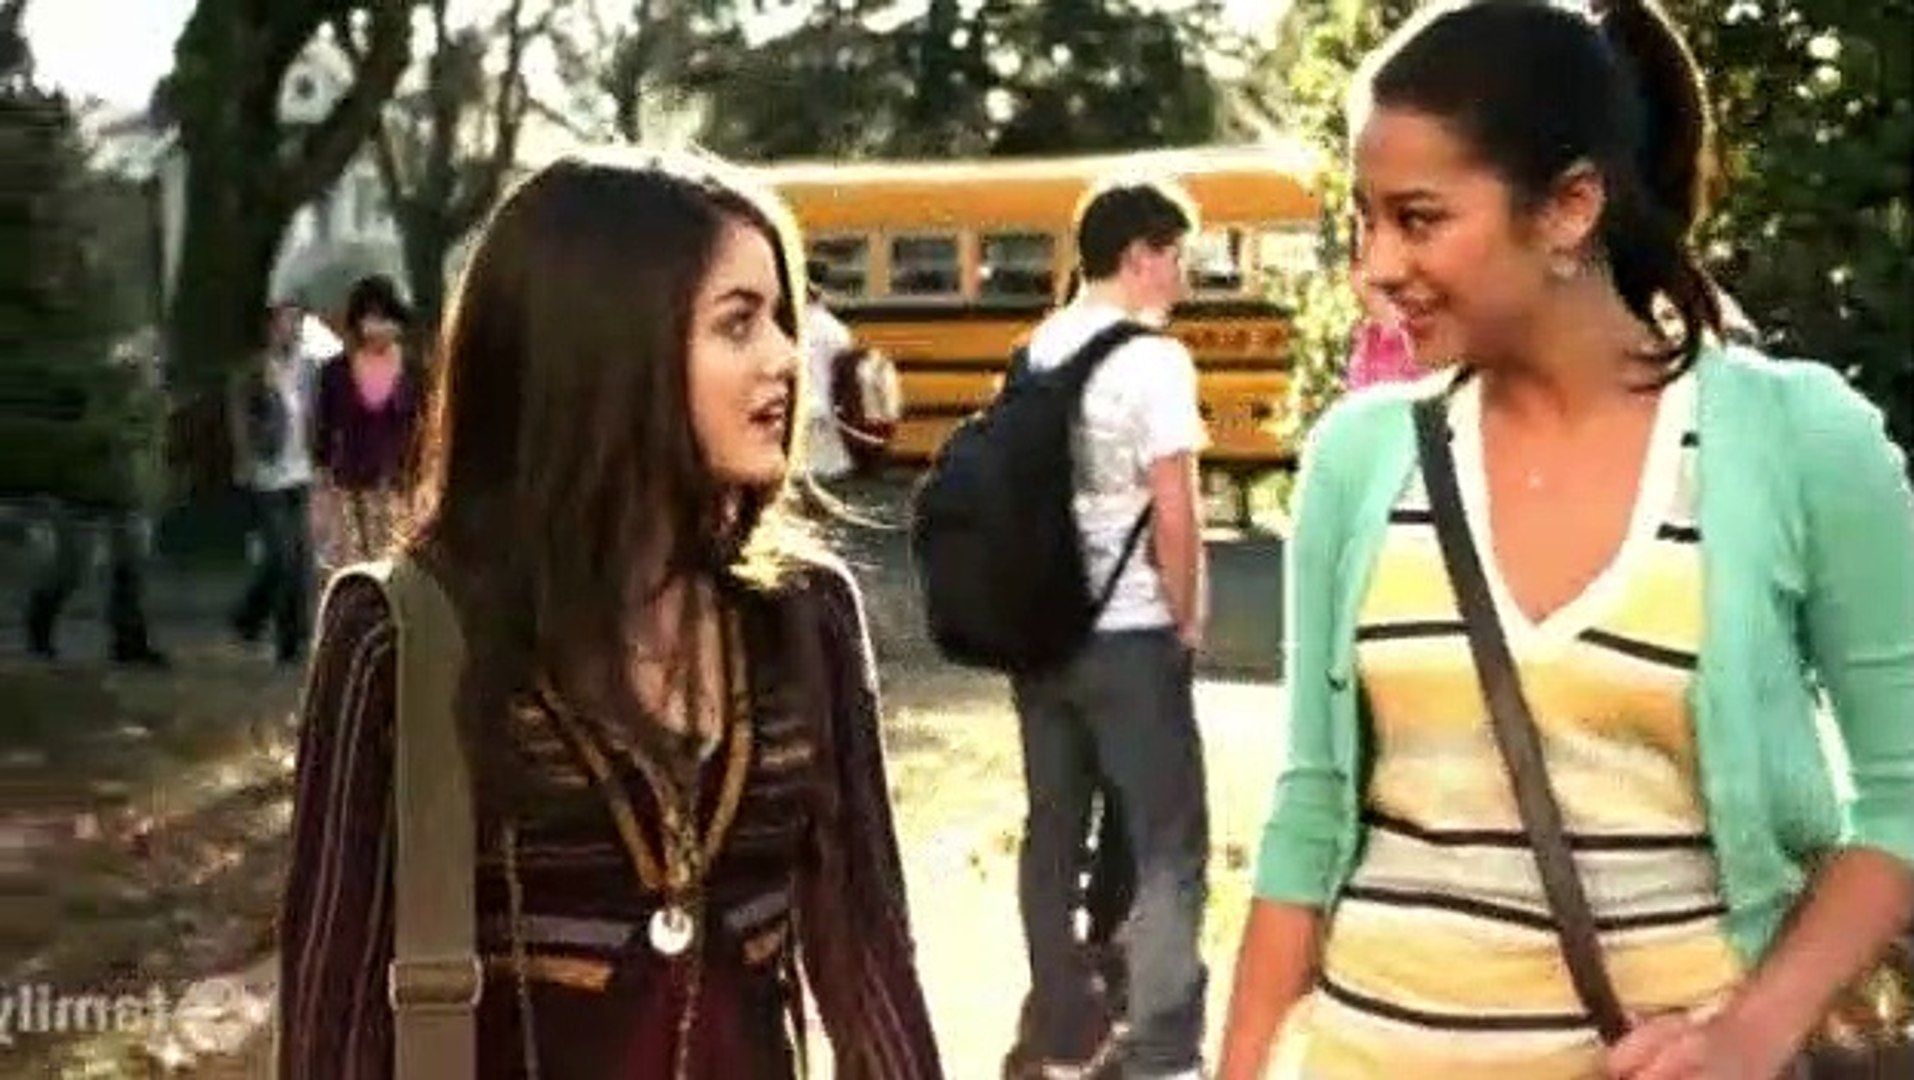 Pretty Little Liars S01E01 - Pilot - video dailymotion